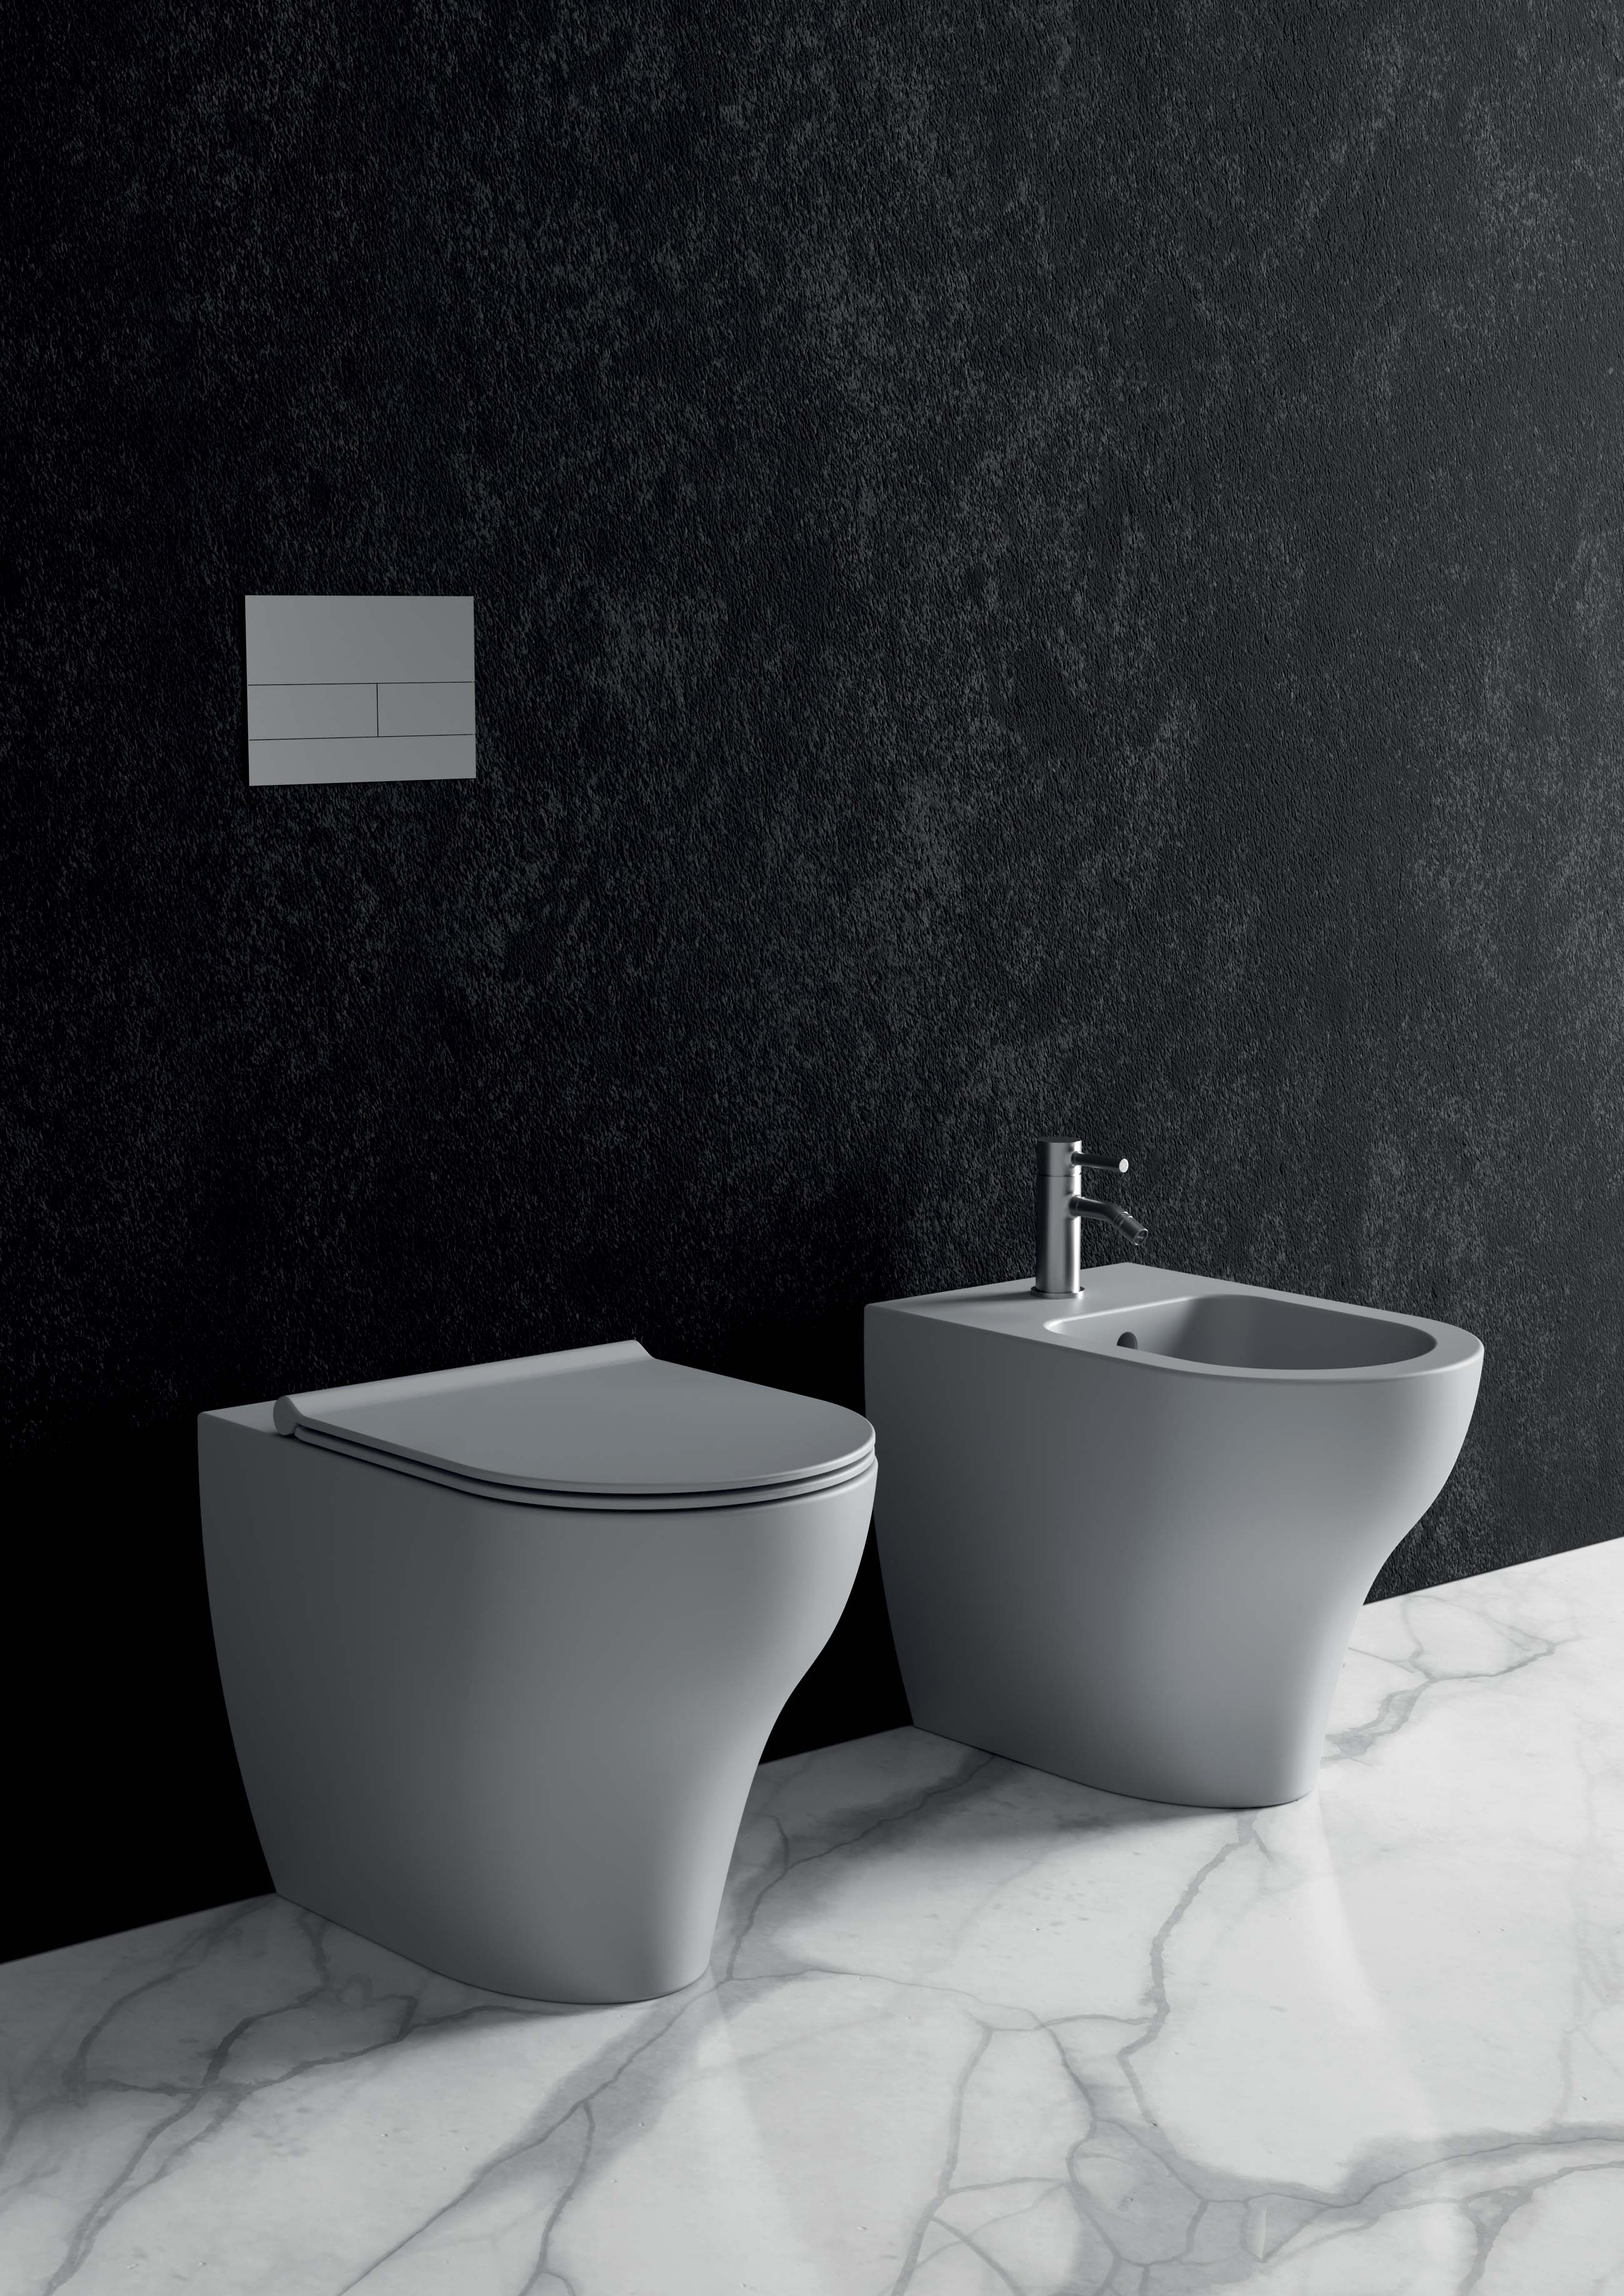 5 - Unica WC Rimless _ Unica Bidet